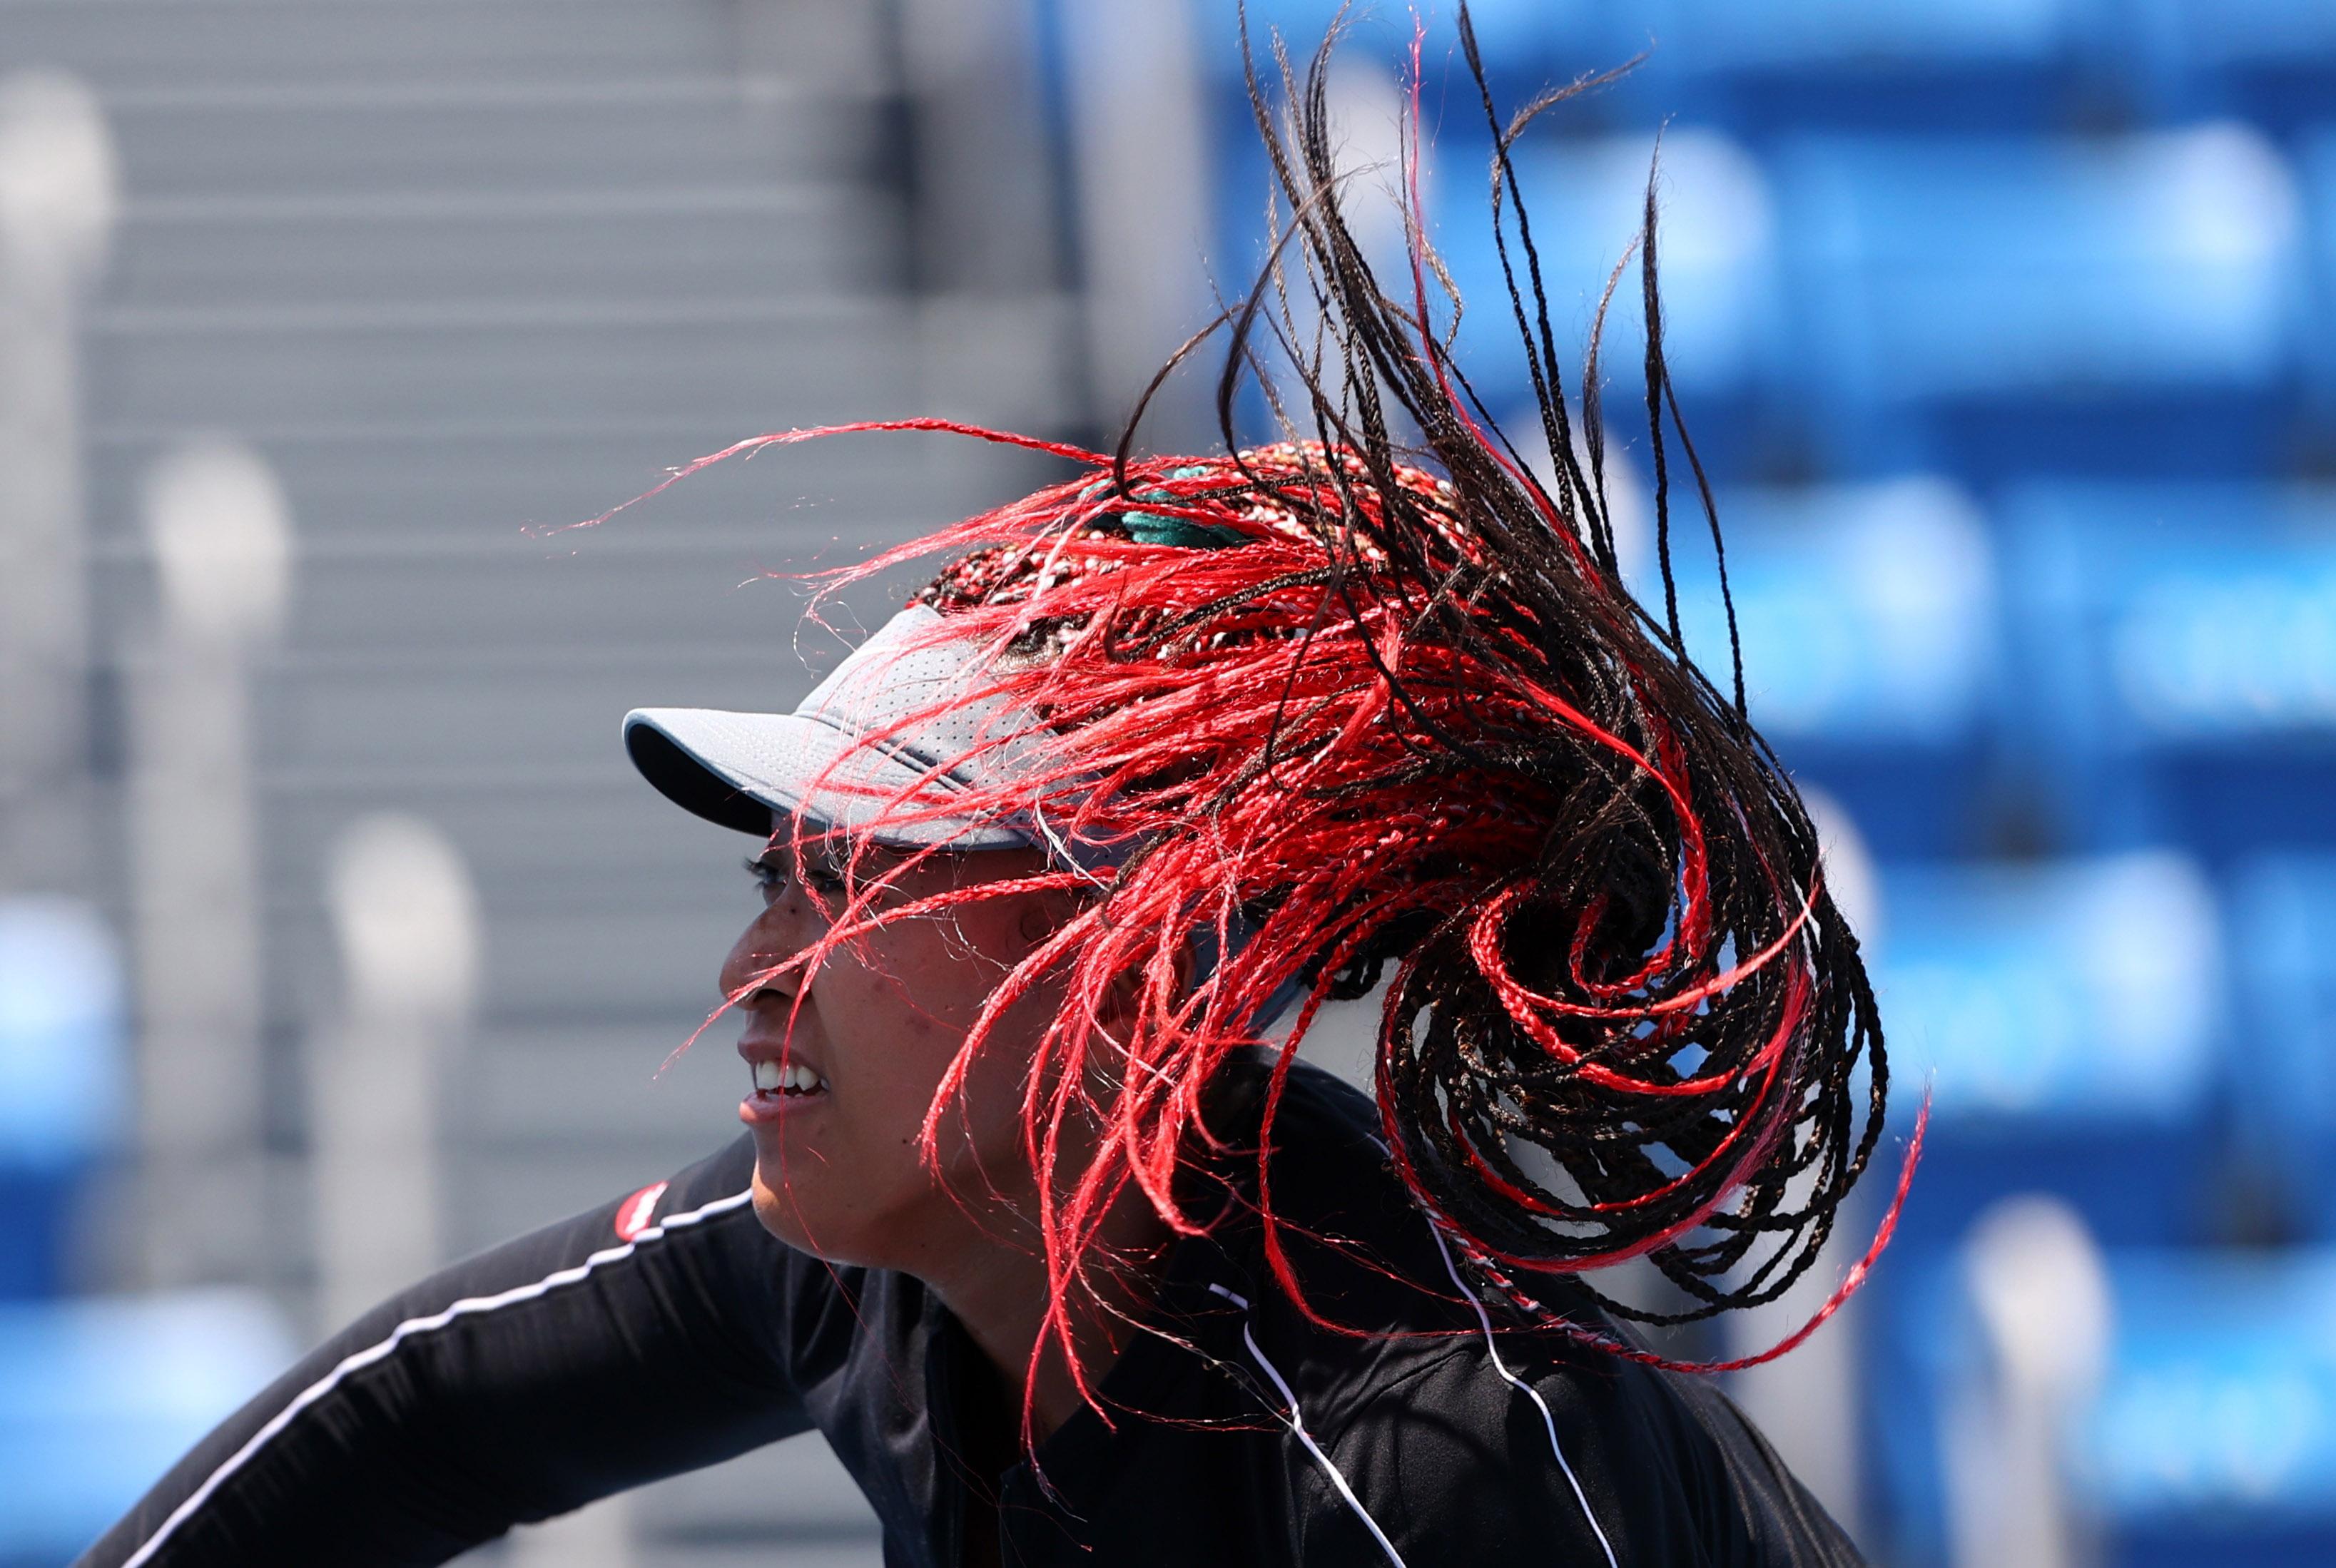 Tokyo 2020 Olympics - Tennis Training - Ariake Tennis Park, Tokyo, Japan - July 23, 2021 - Naomi Osaka of Japan during training. REUTERS/Mike Segar